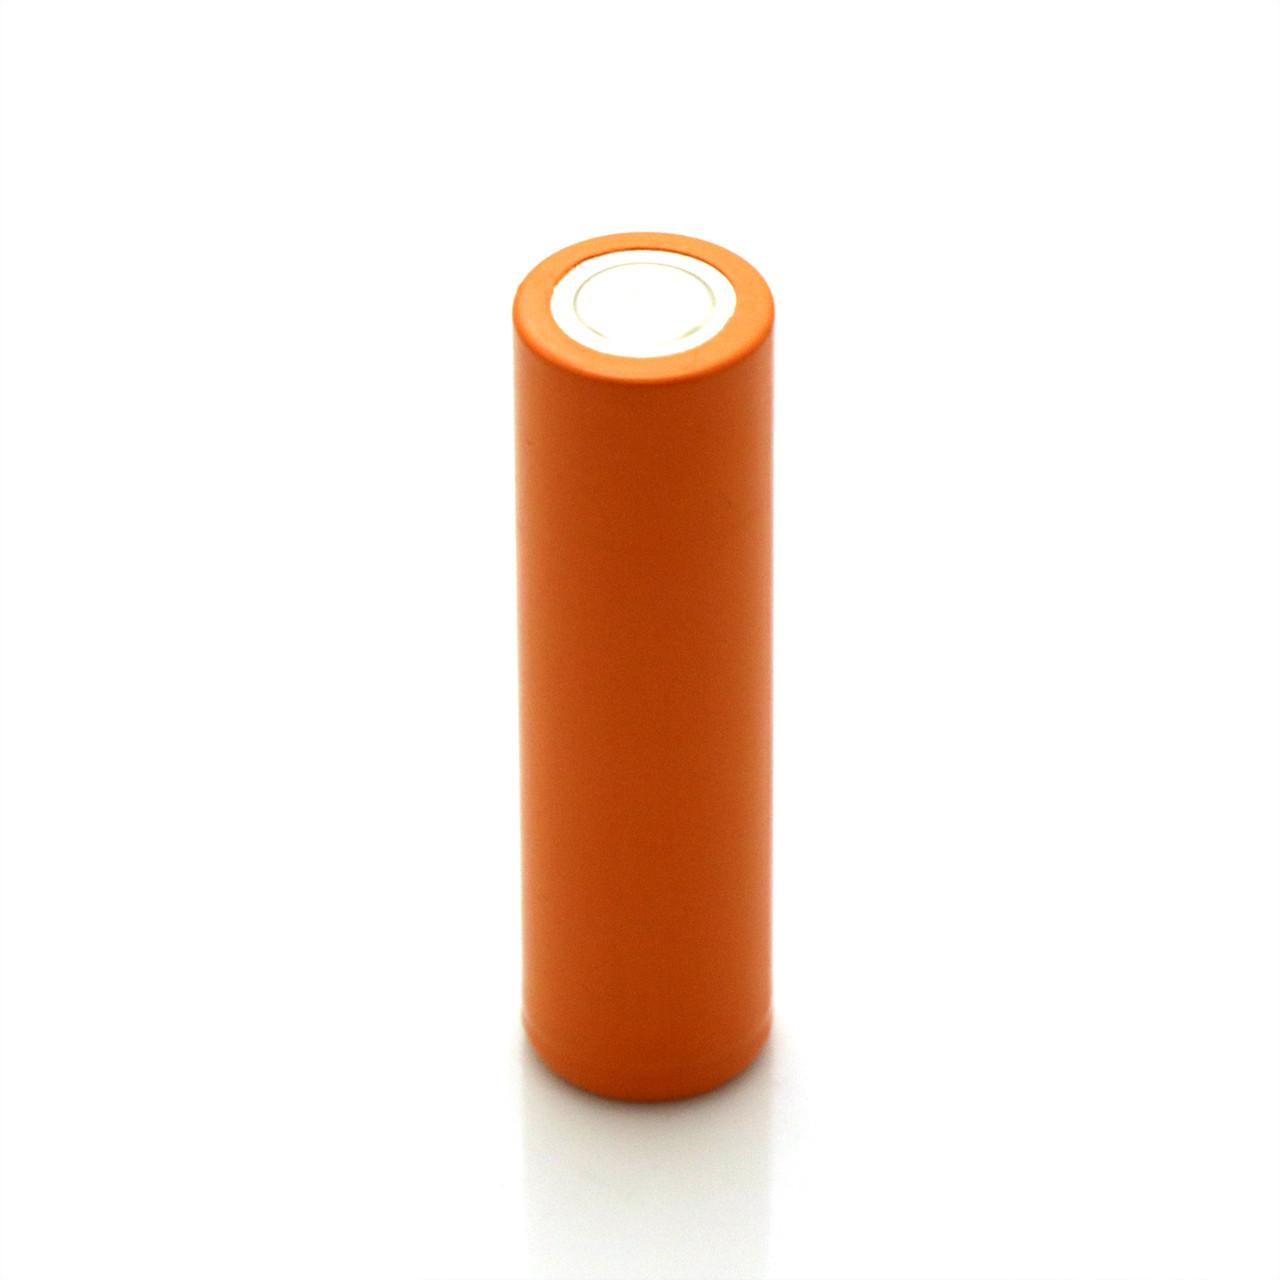 Tenergy 3.2V 1450mah LiFePO4 18650 (LR18650EC) Rechargeable Battery, Flat Top